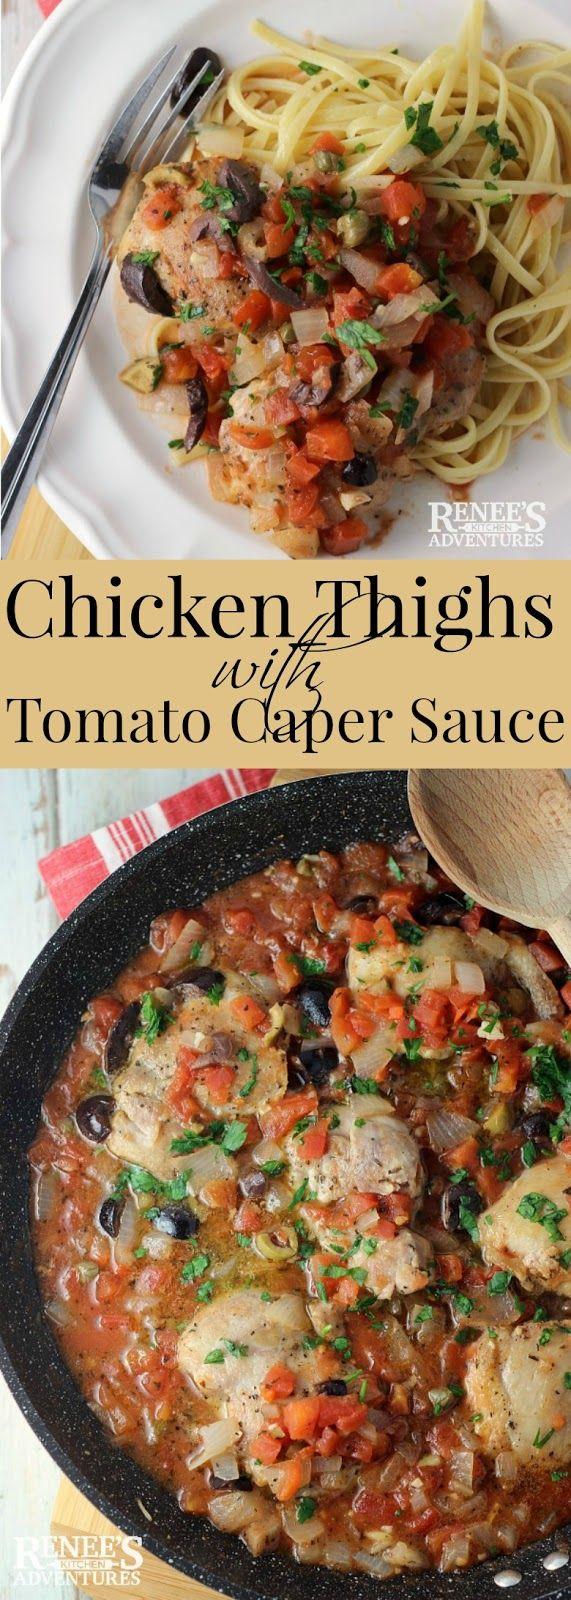 Chicken Thighs with Tomato Caper Sauce | Renee's Kitchen Adventures